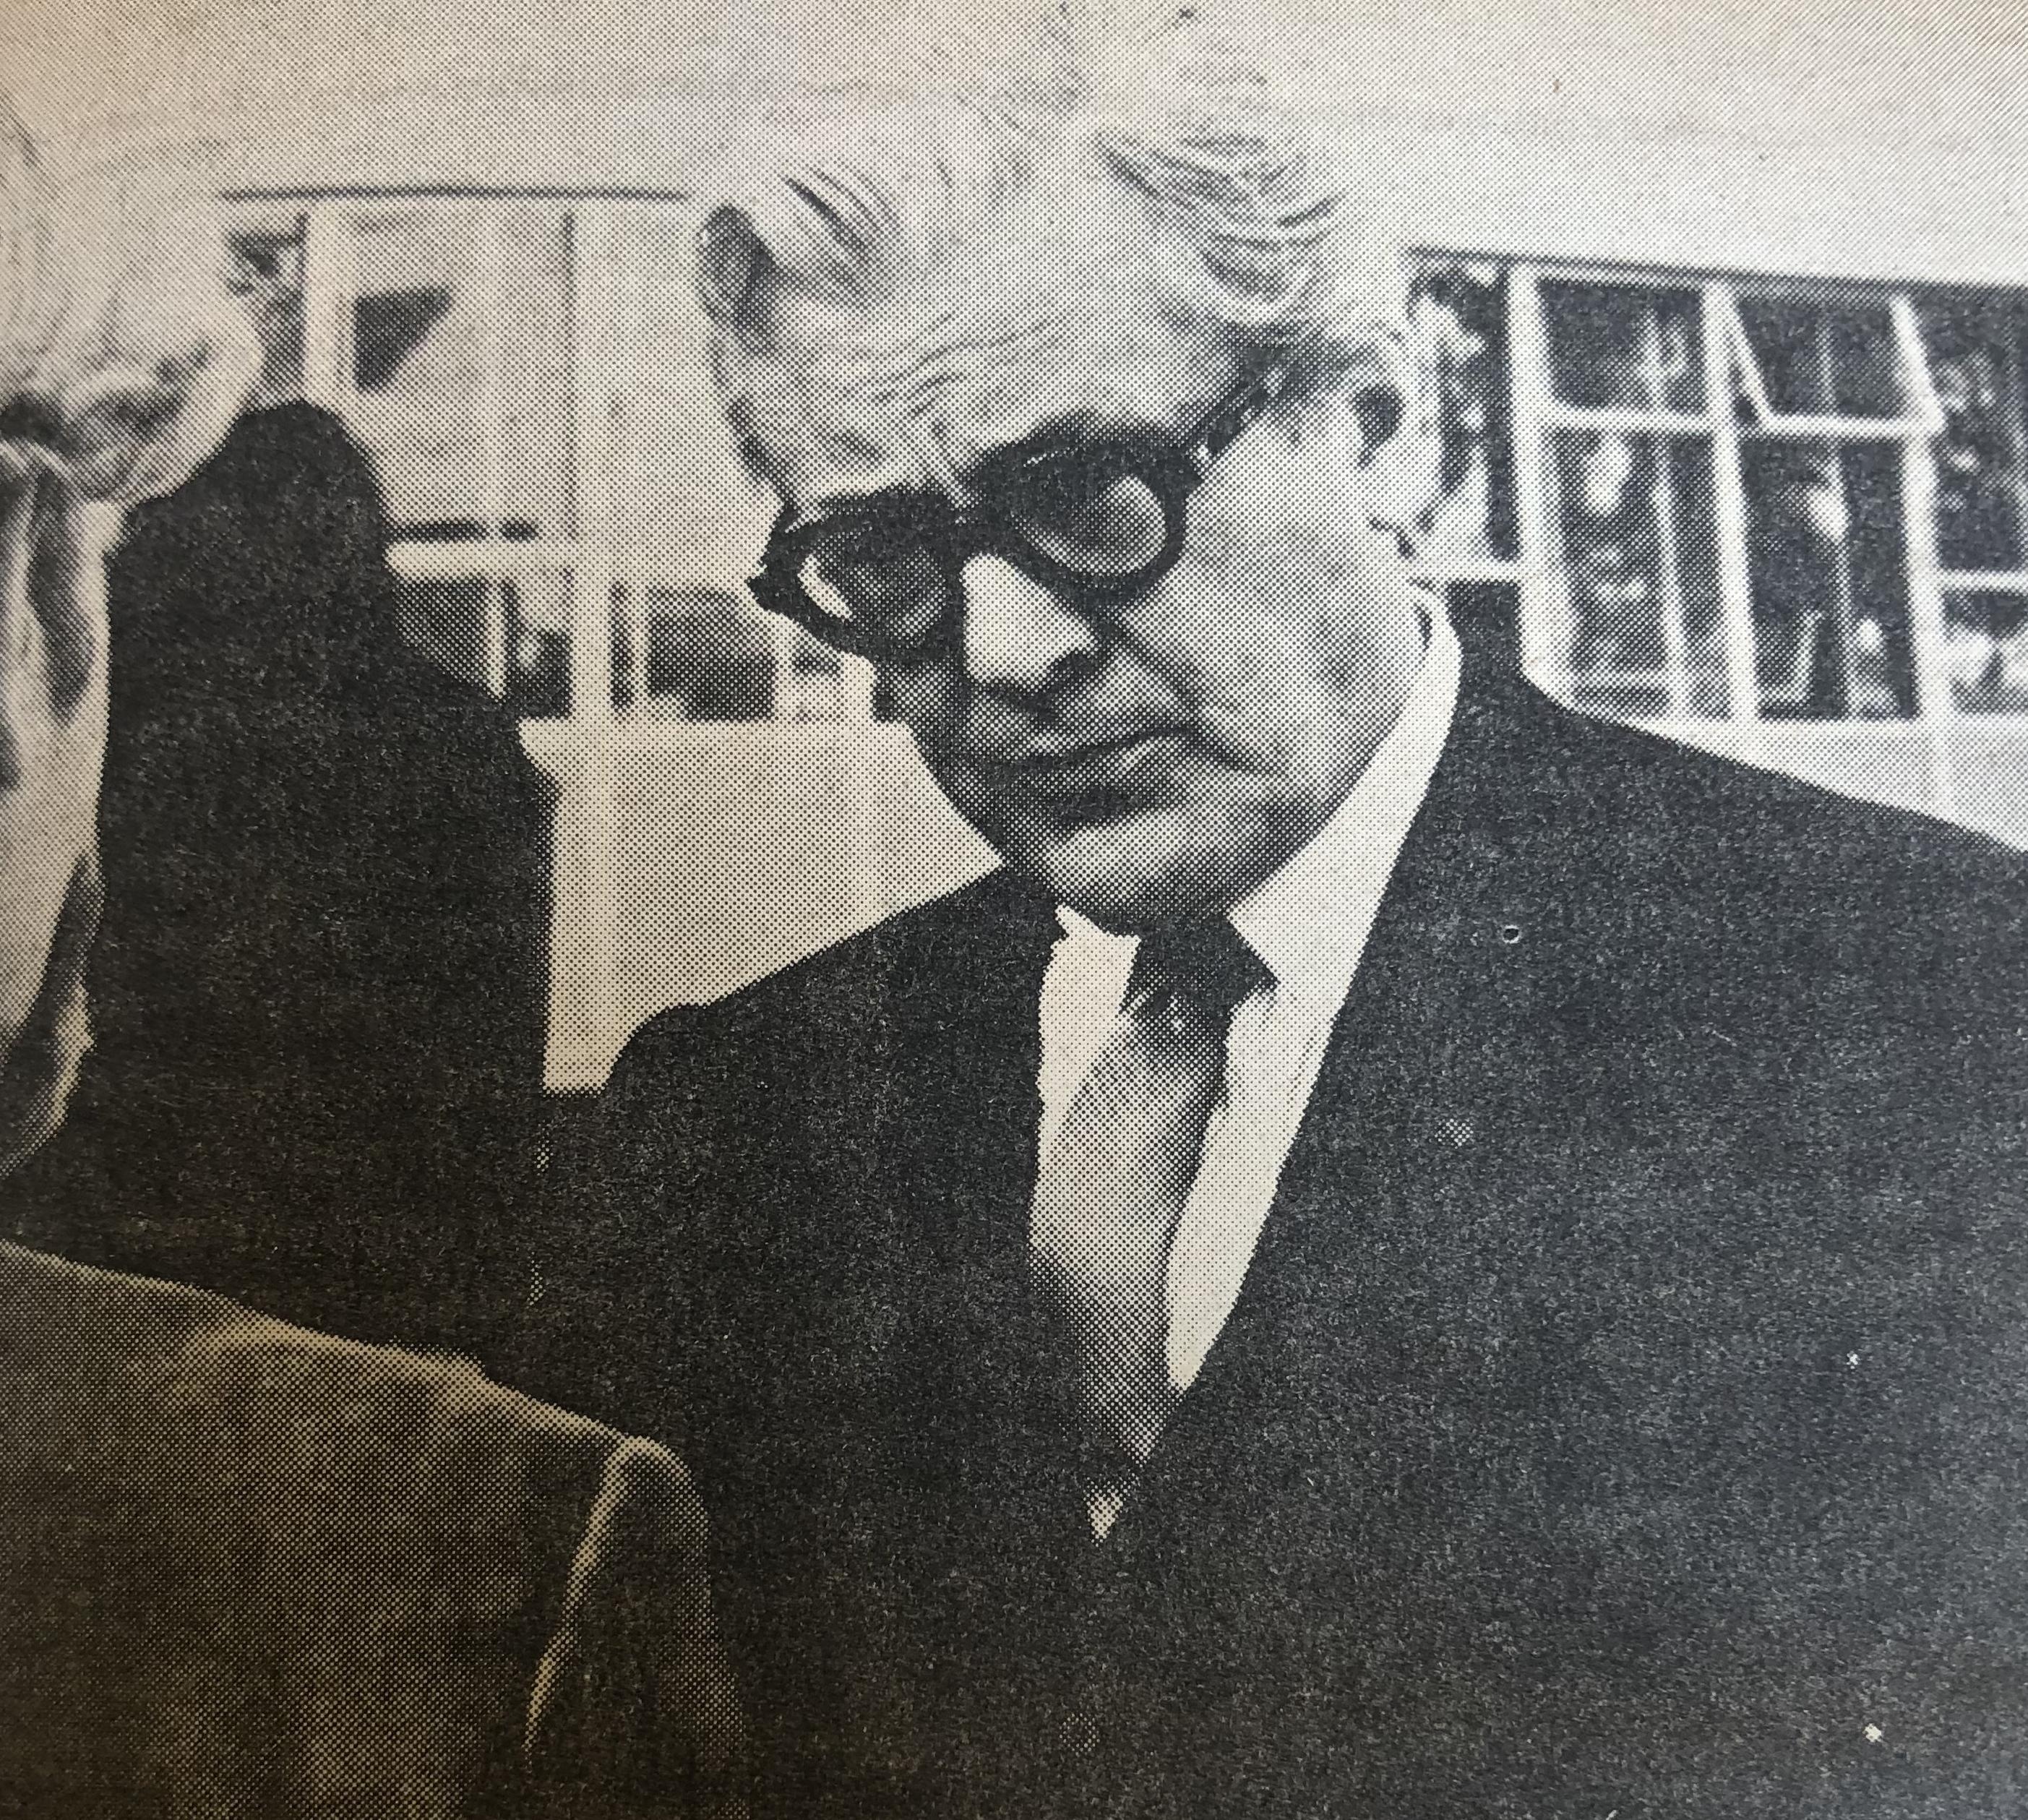 Melvin Belli.  Berkeley Citizen, January 20, 1967